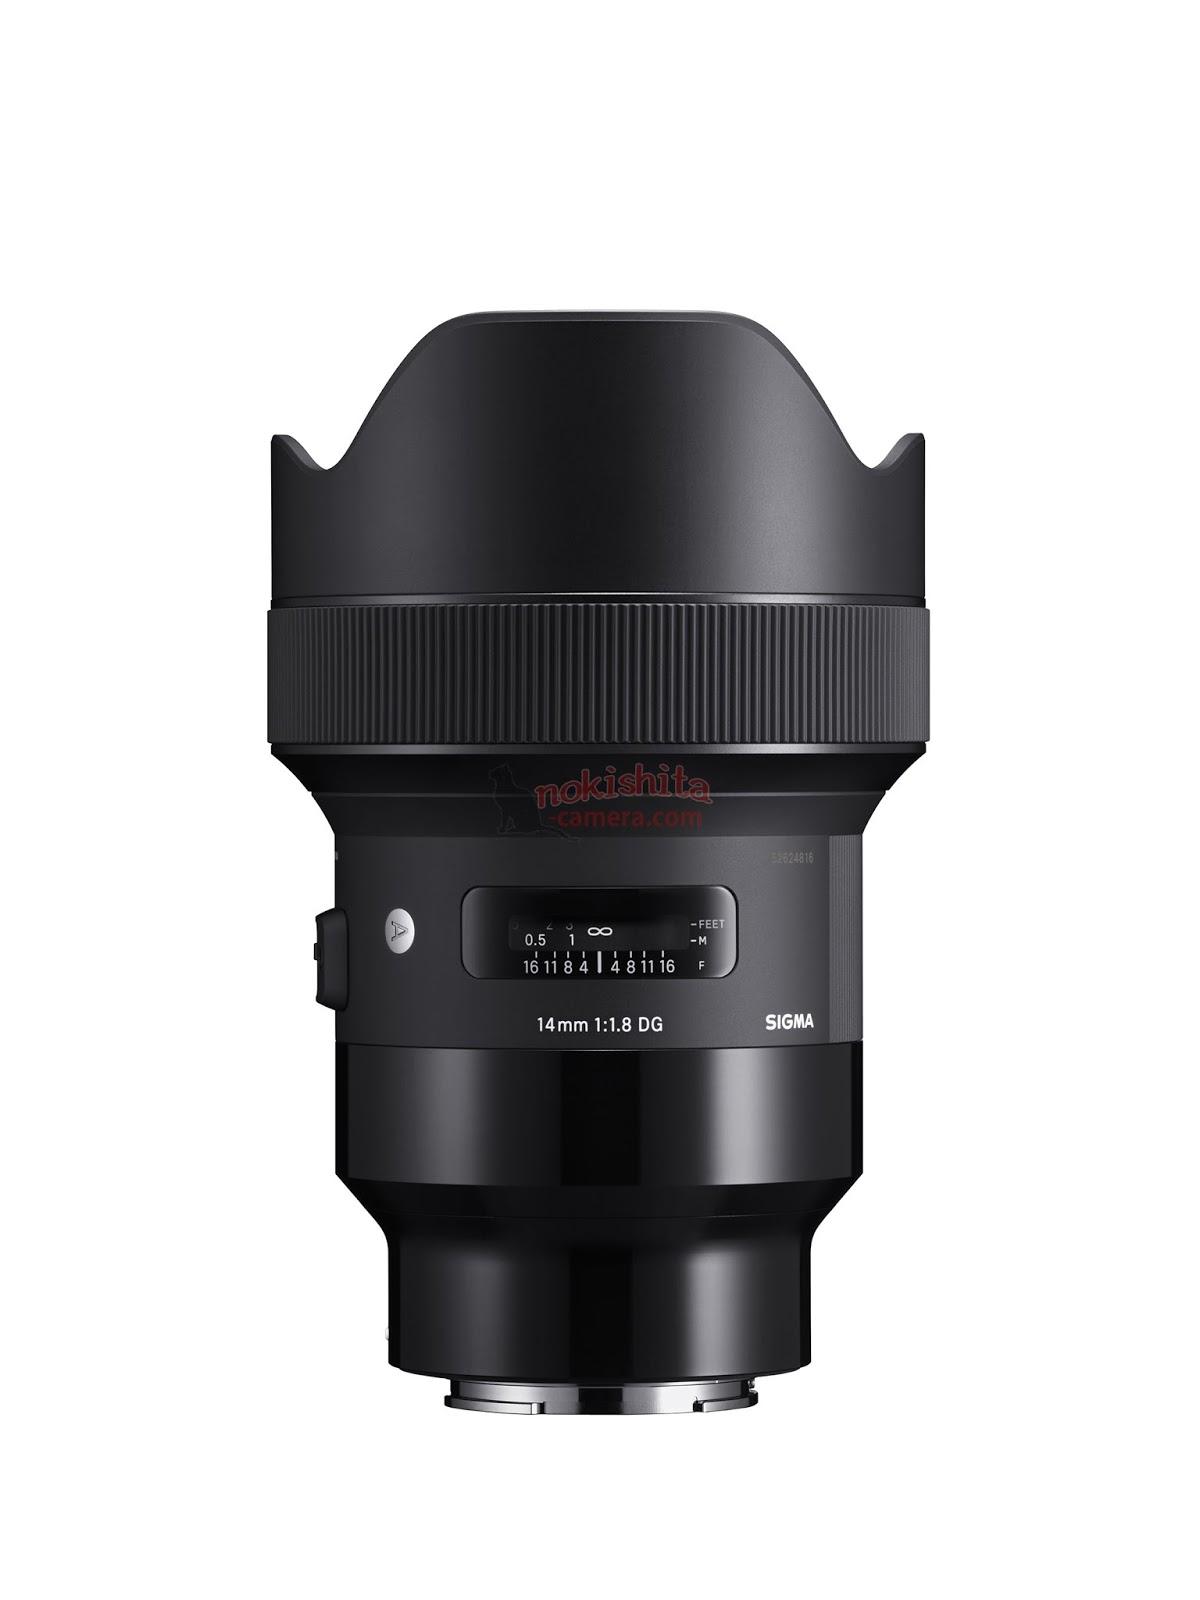 Sigma 105mm f/1.4 DG HSM | Art review - Techero - Geeks